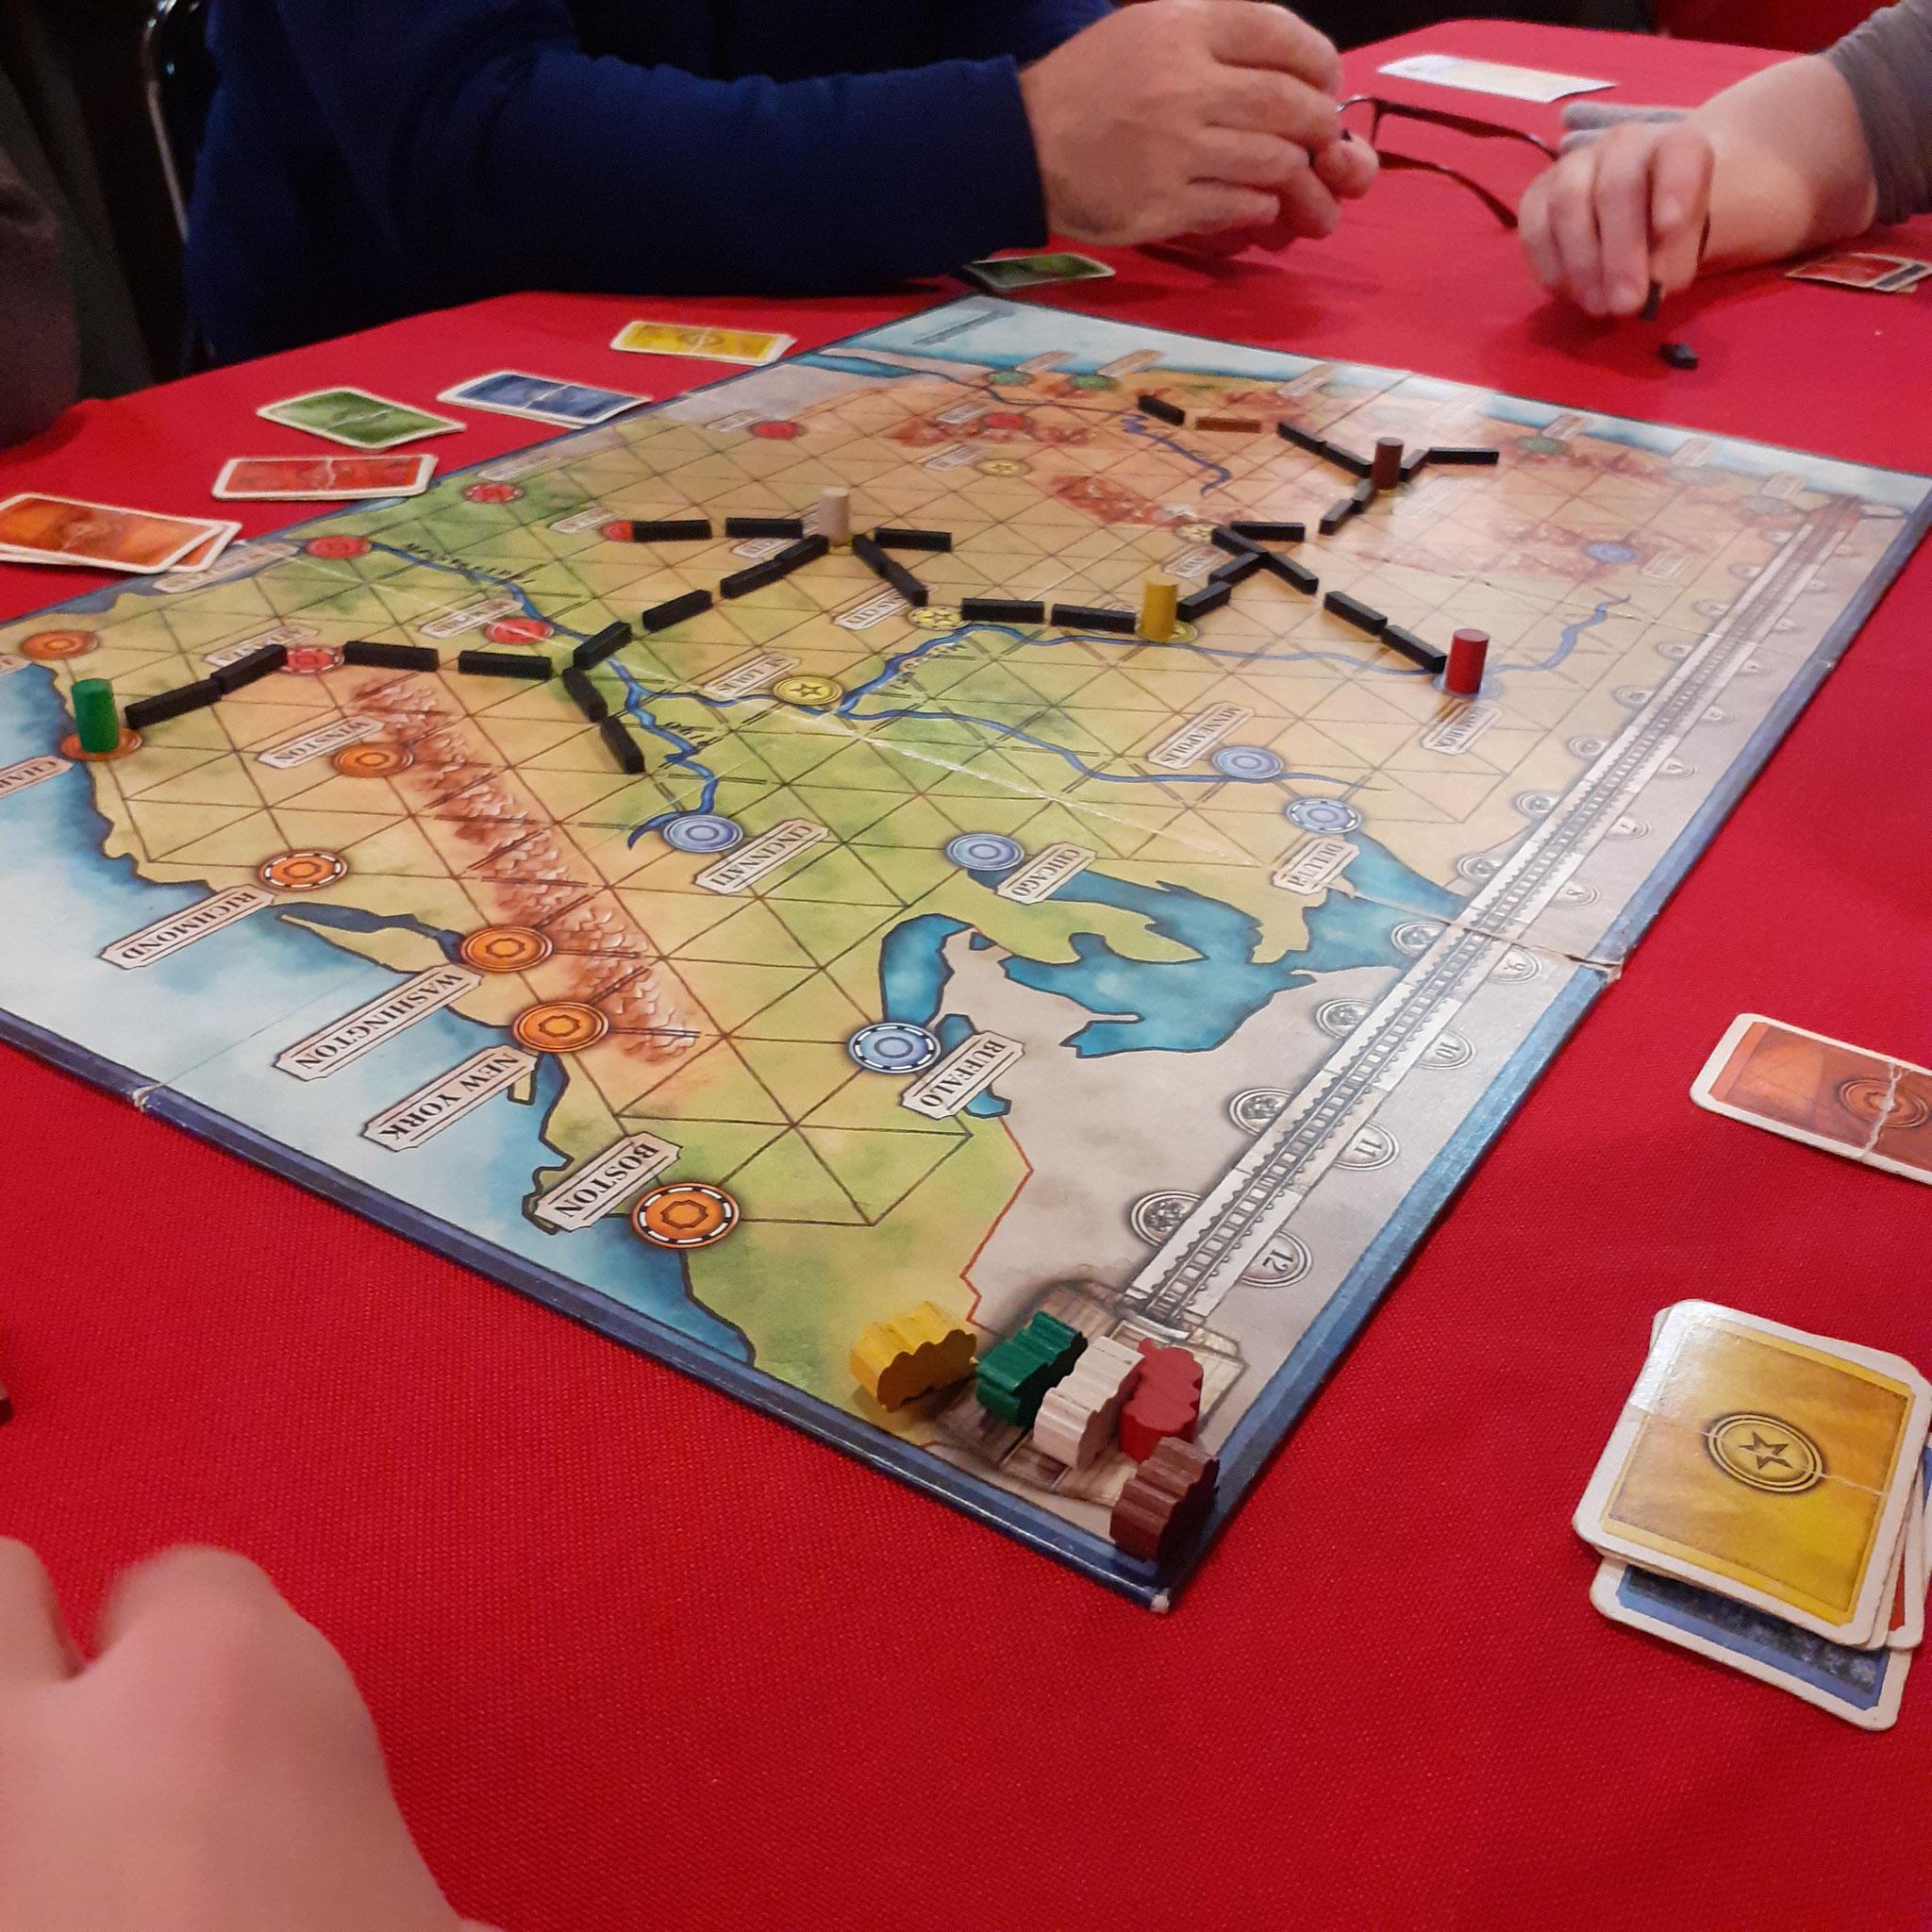 Soirée-jeux : Transamerica